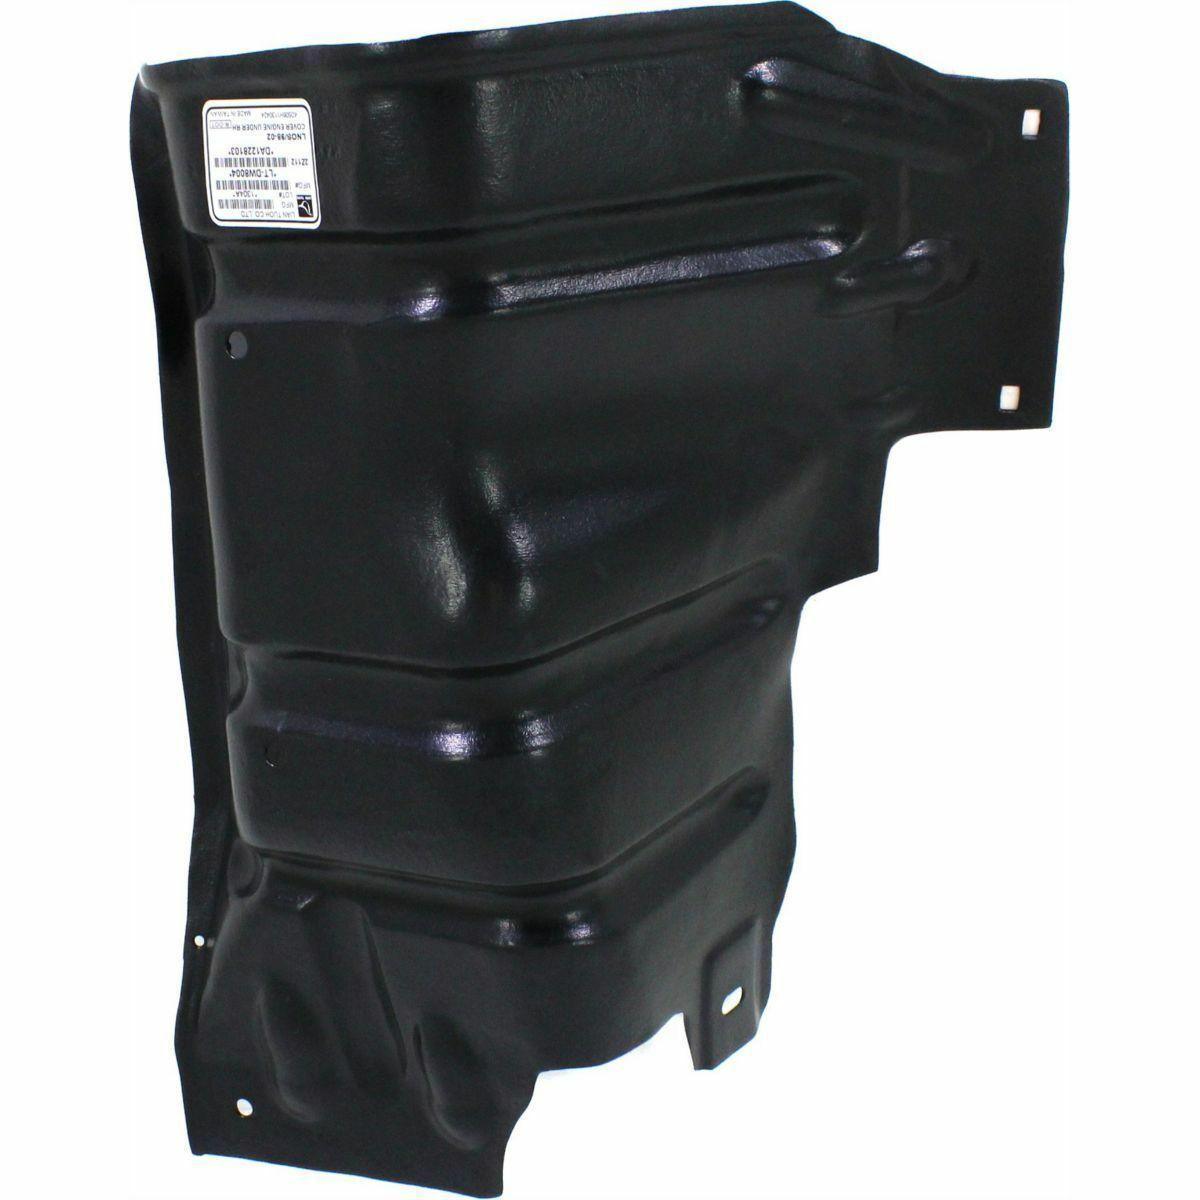 New Passenger Side Engine Splash Shield Fits 1999-2002 ...